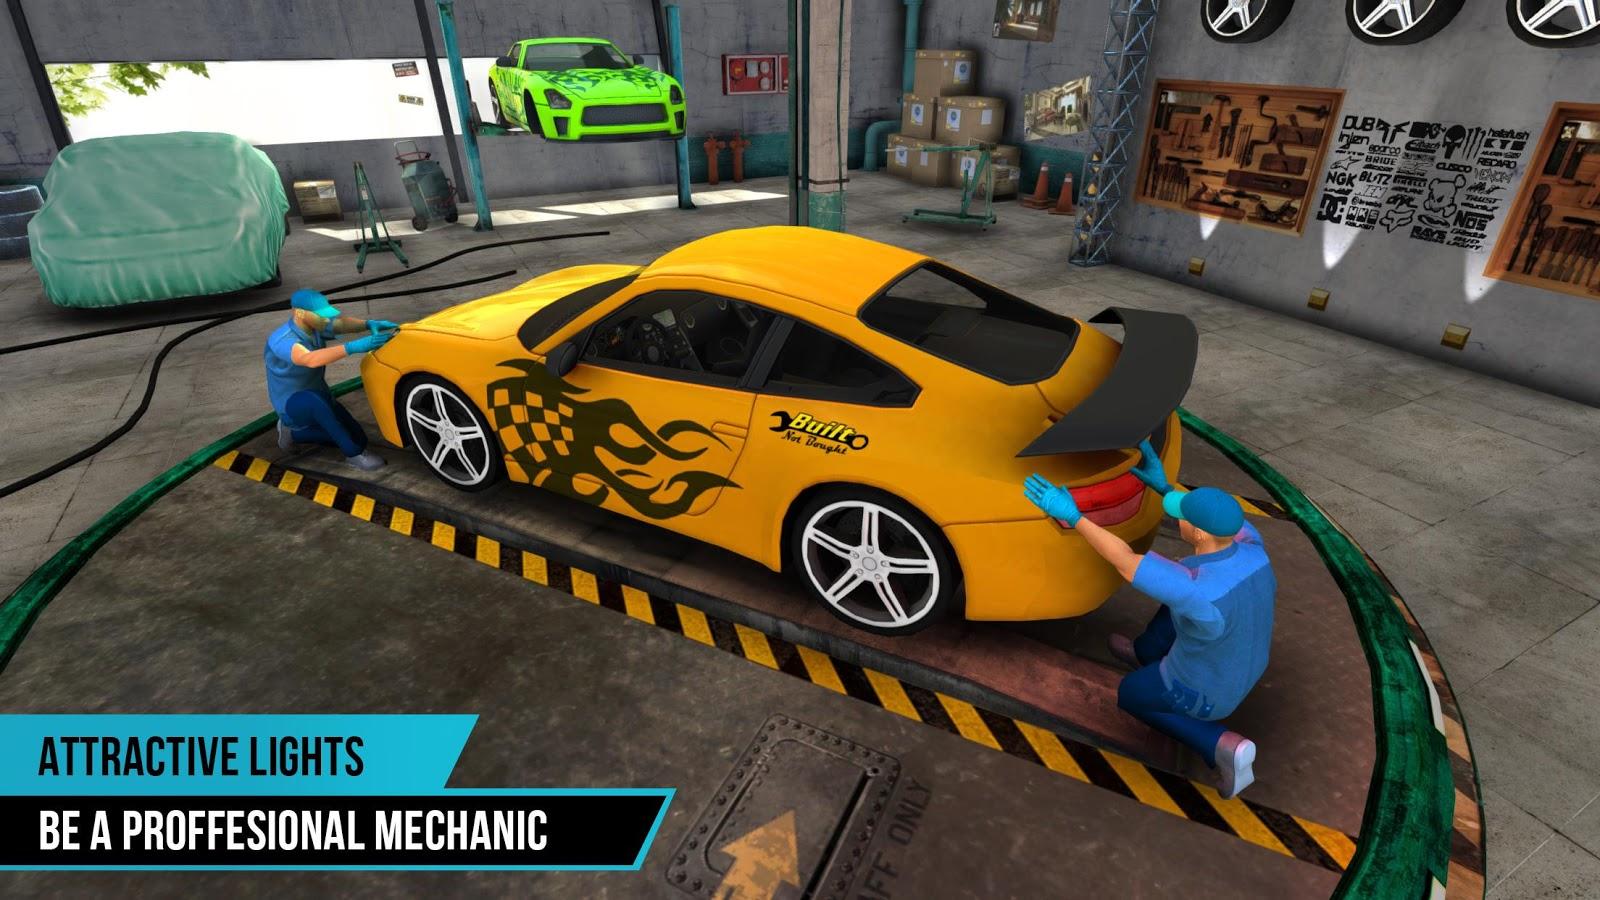 Fixing Car Games Play